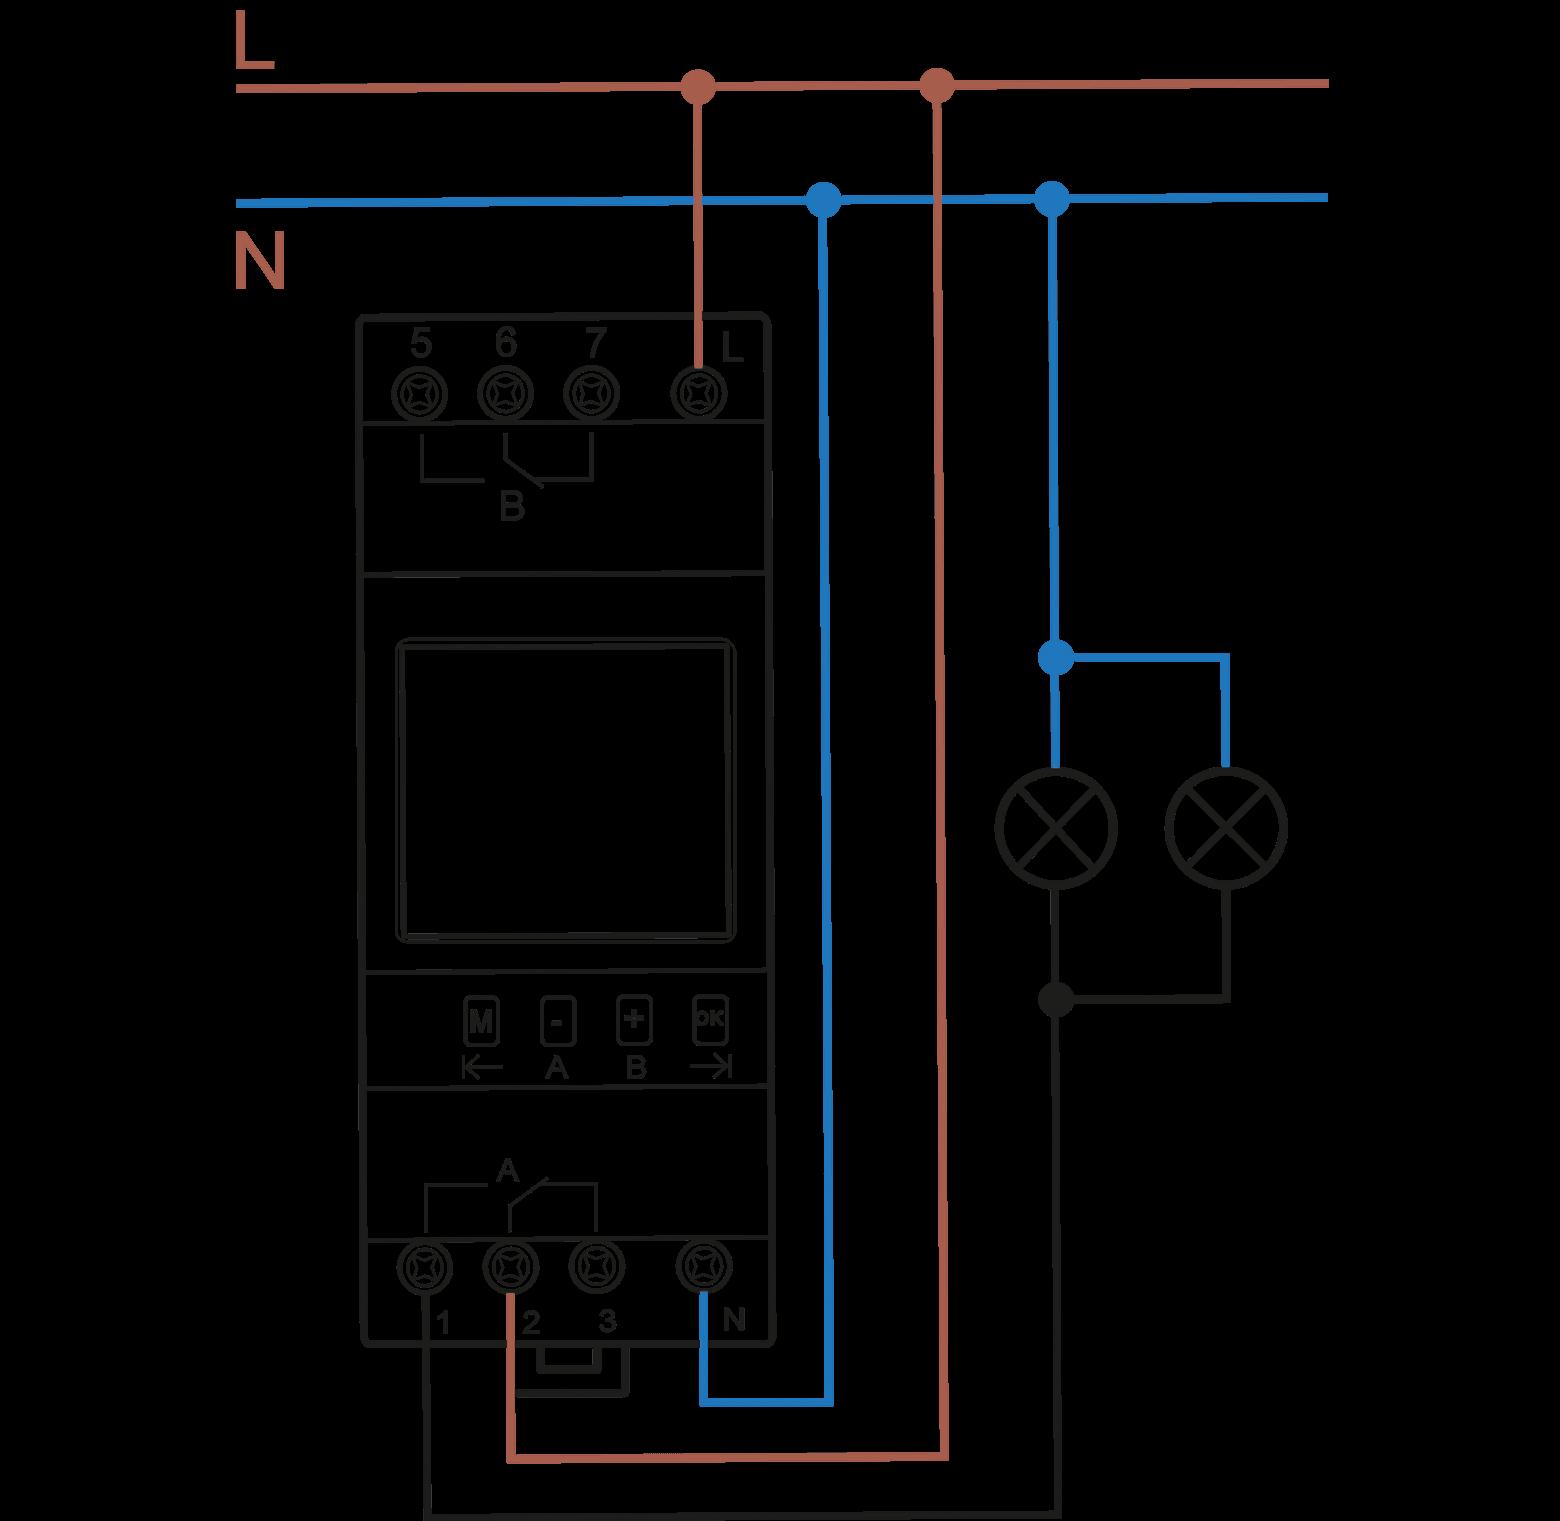 Схема подключения вентилятора через реле времени